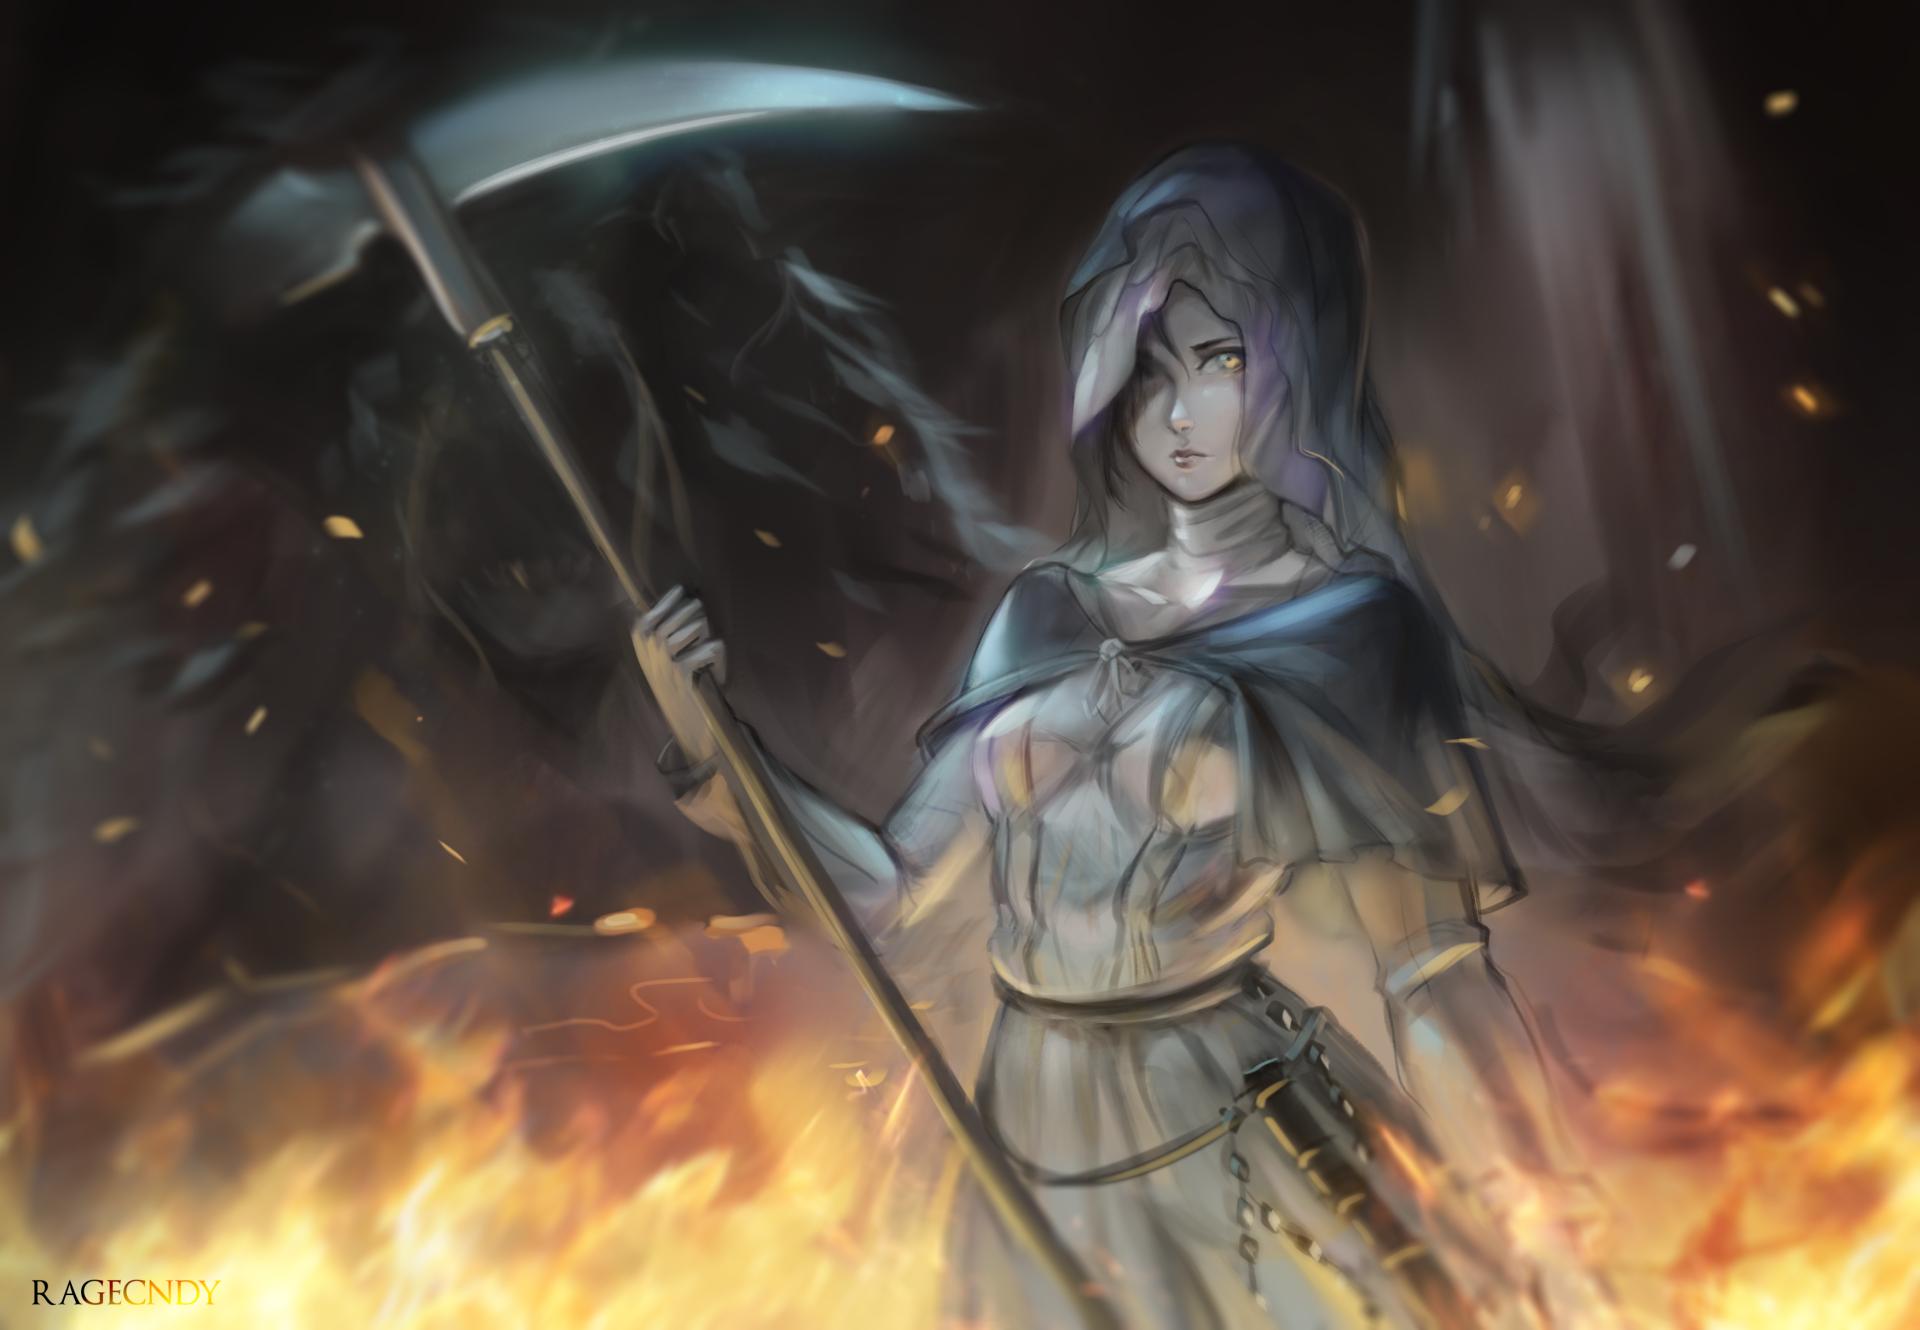 1 Sister Friede Dark Souls Hd Wallpapers Background Images